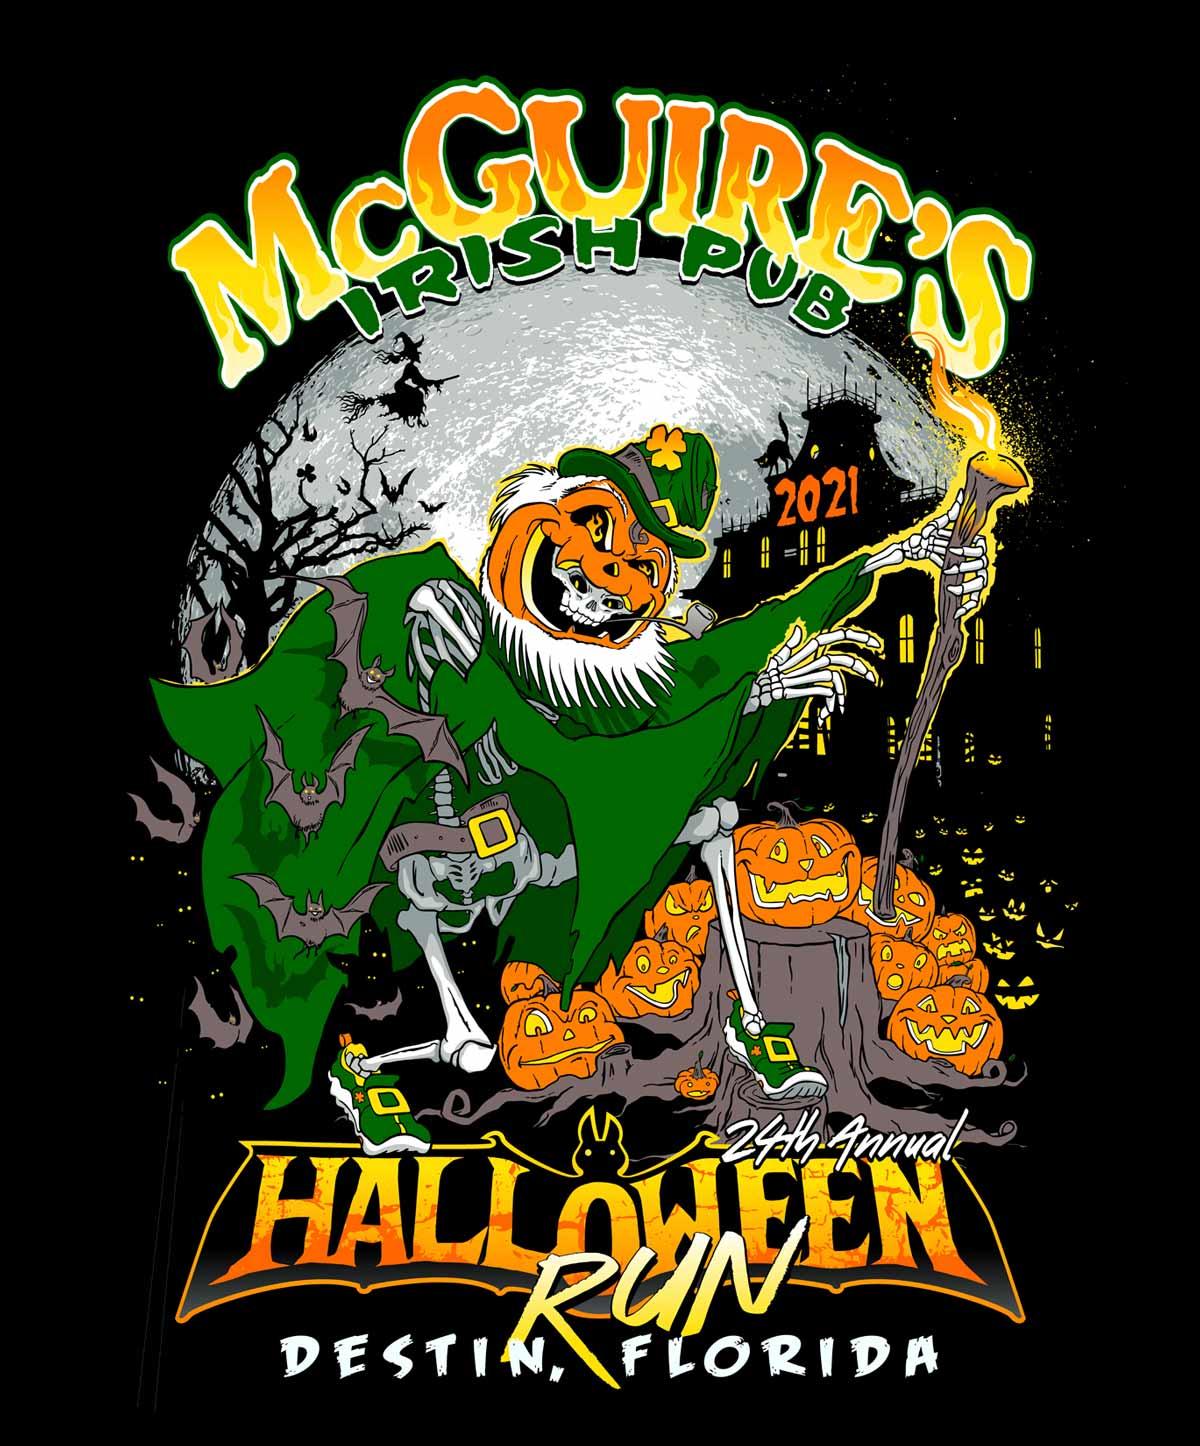 McGuire's of Destin 24th Annual Halloween 5K Run/Walk 10K Run